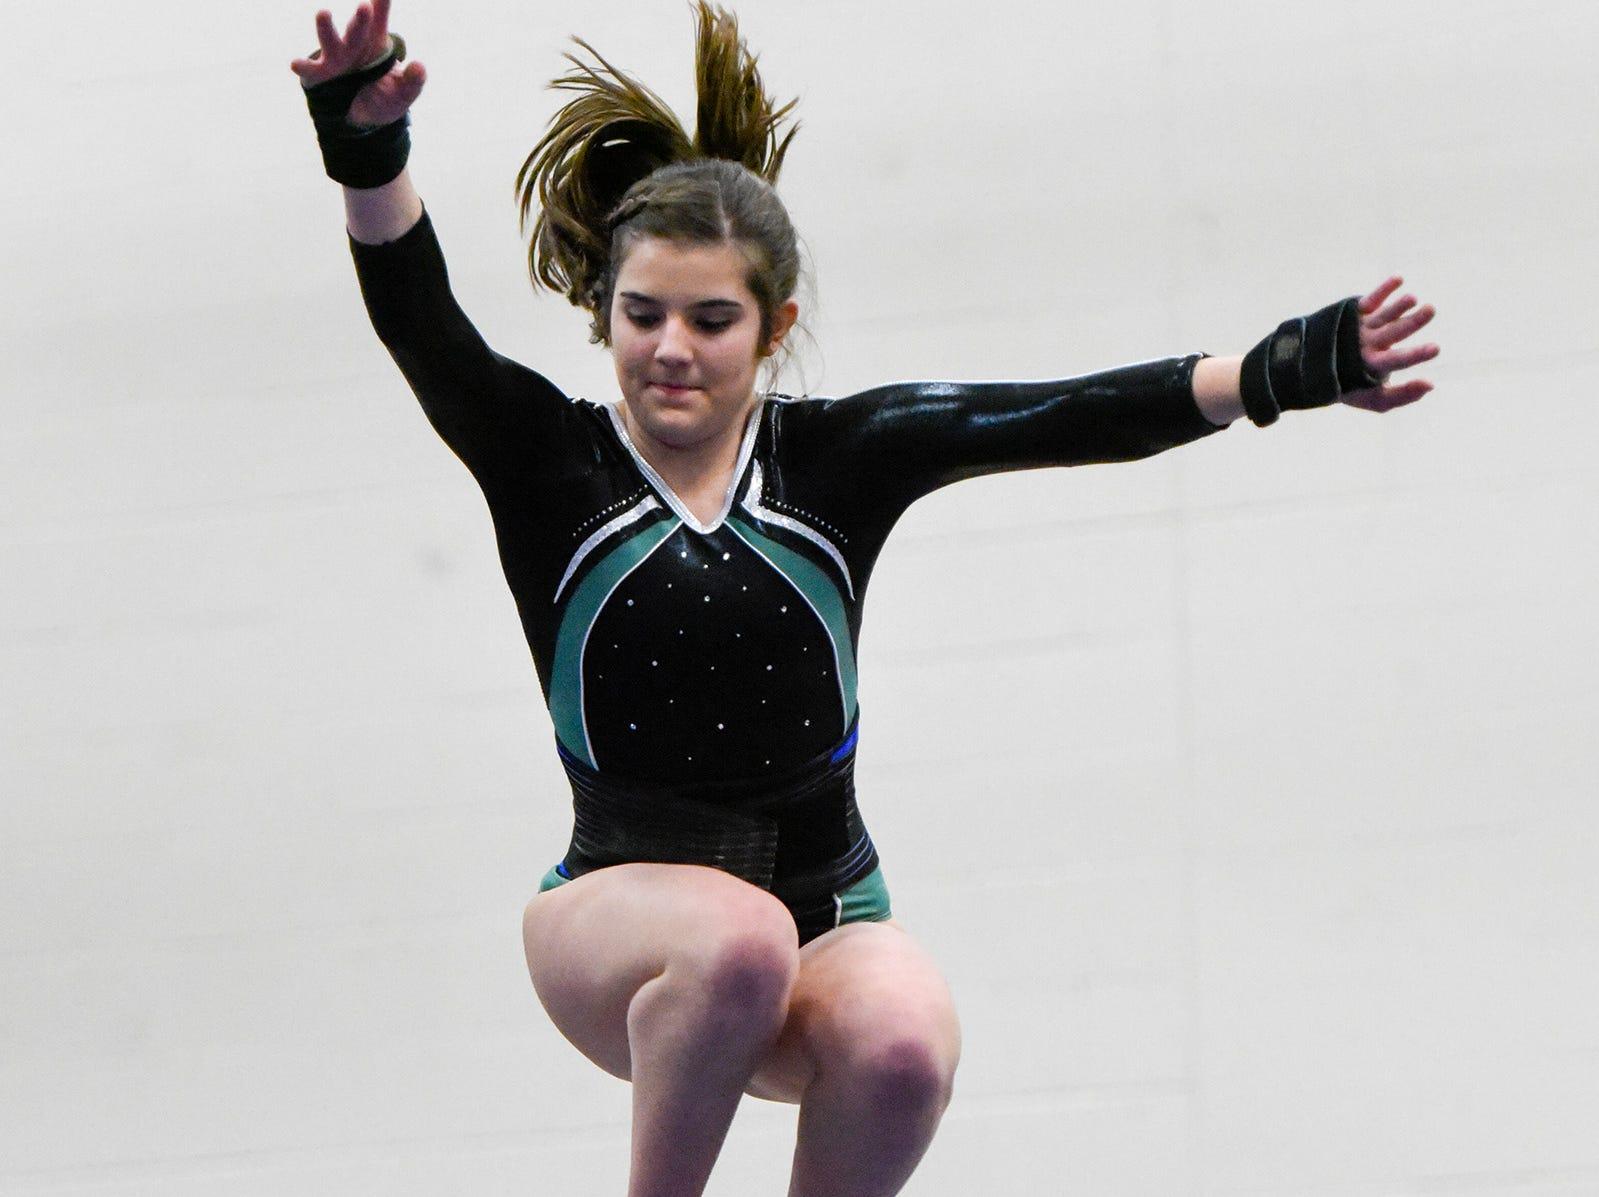 Sauk Rapids' Taylor Helget competes on the beam Thursday, Jan. 3, at the Sauk Rapids-Rice High School.